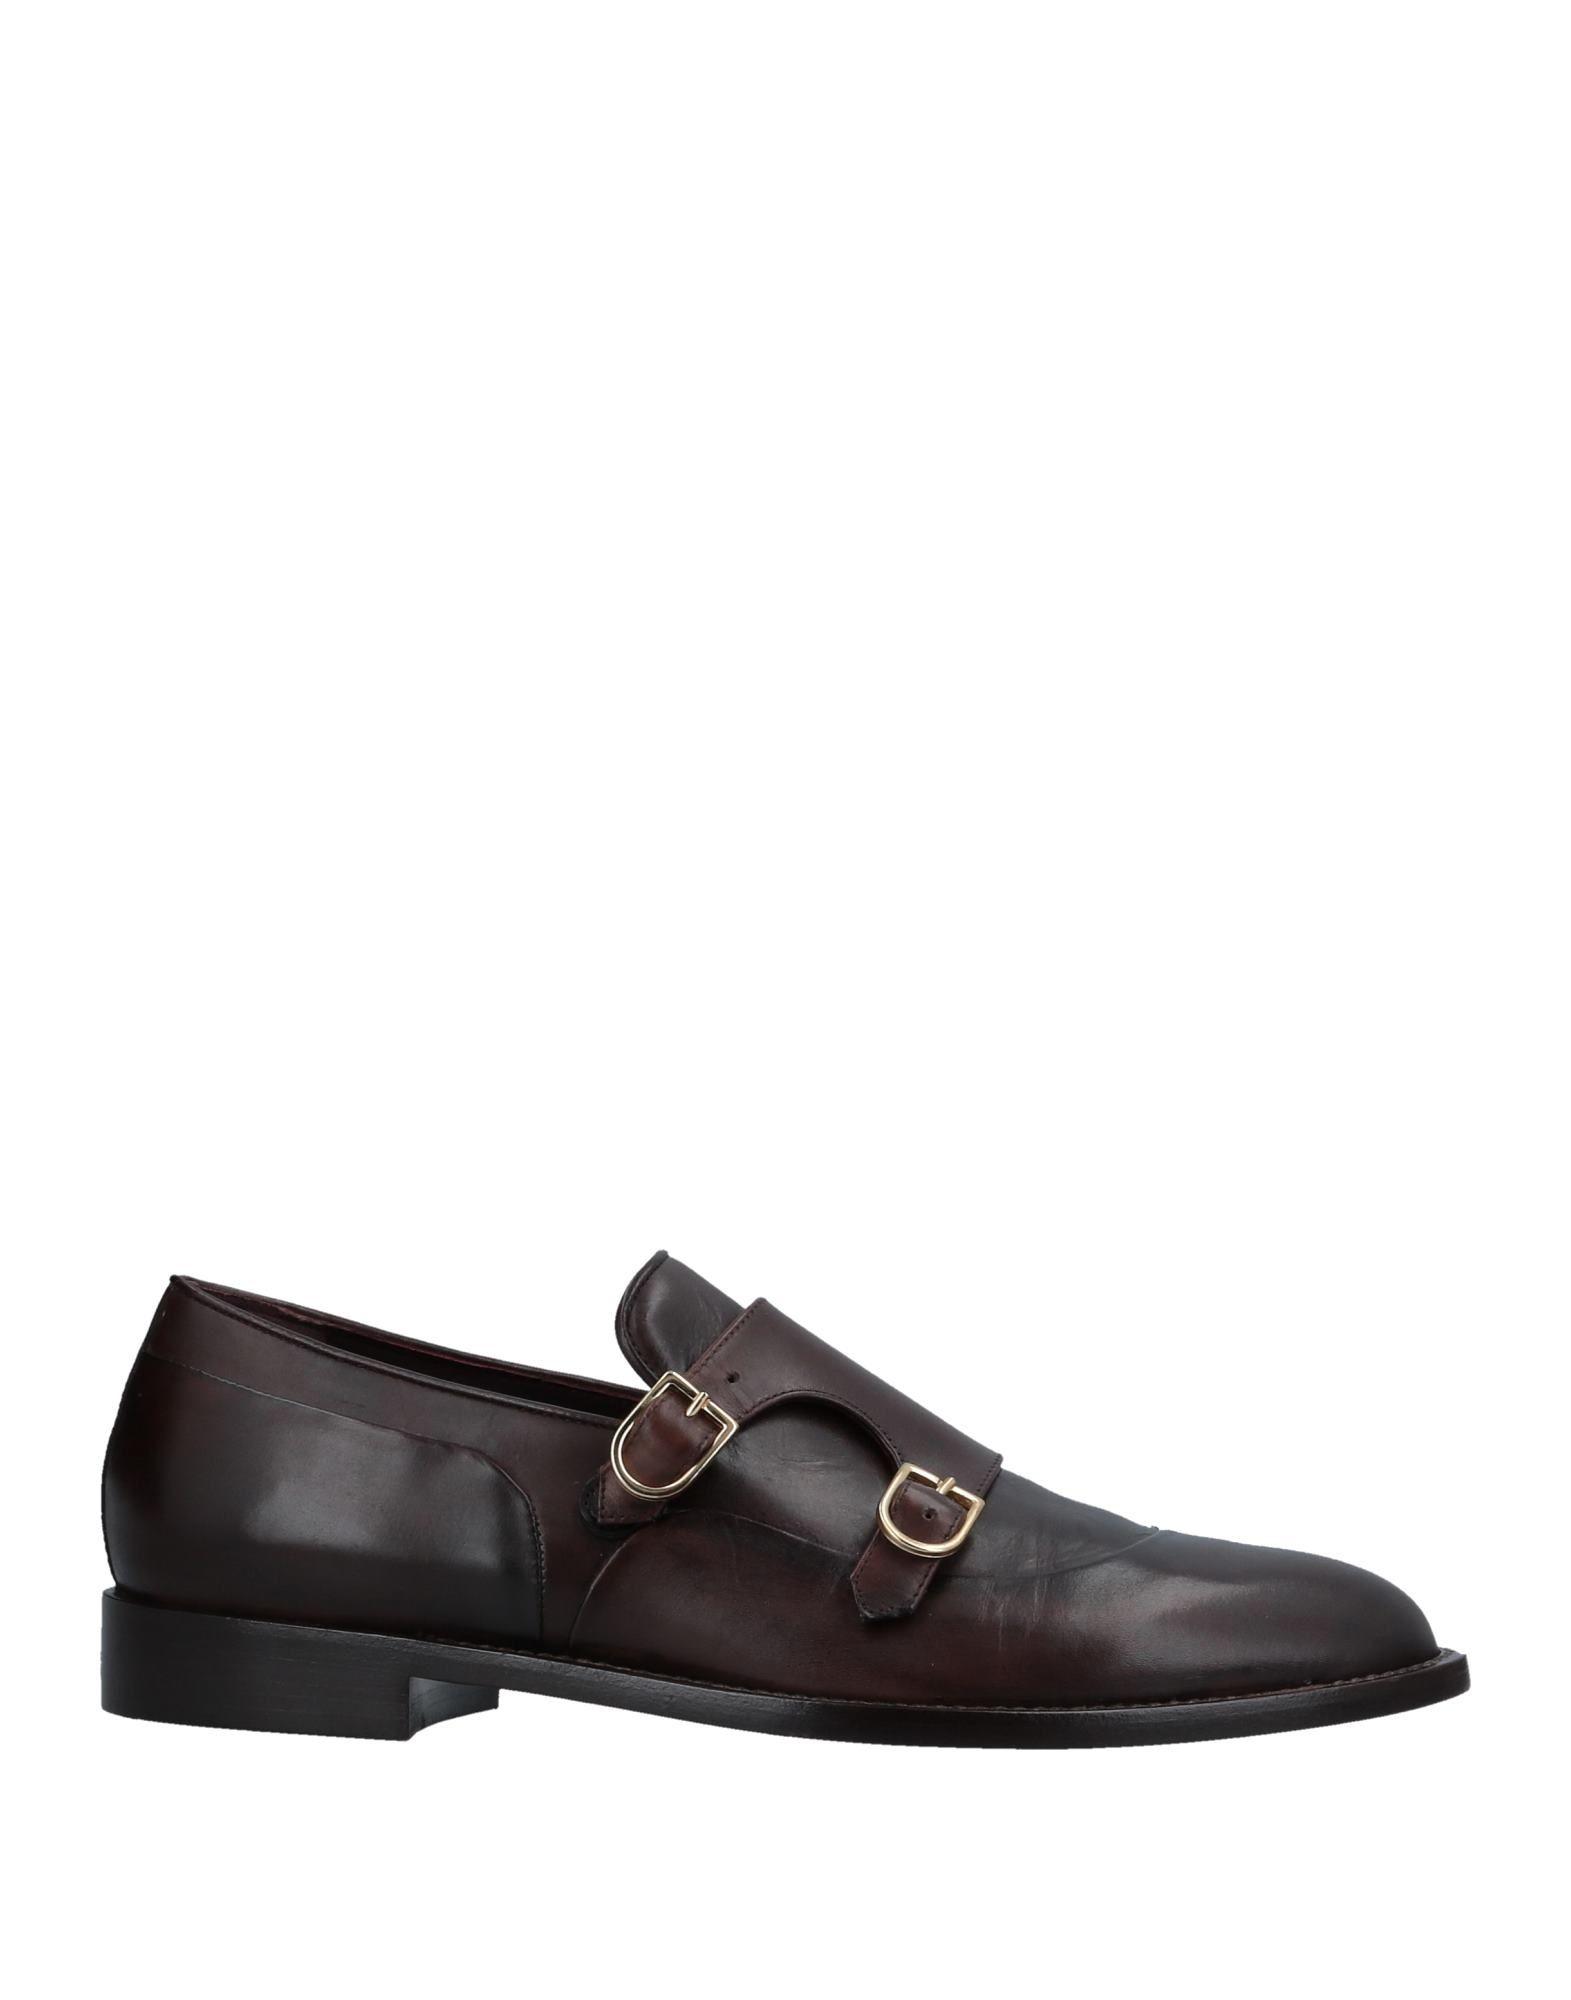 Edhèn Milano Mokassins Herren  11508052XG Gute Qualität beliebte Schuhe